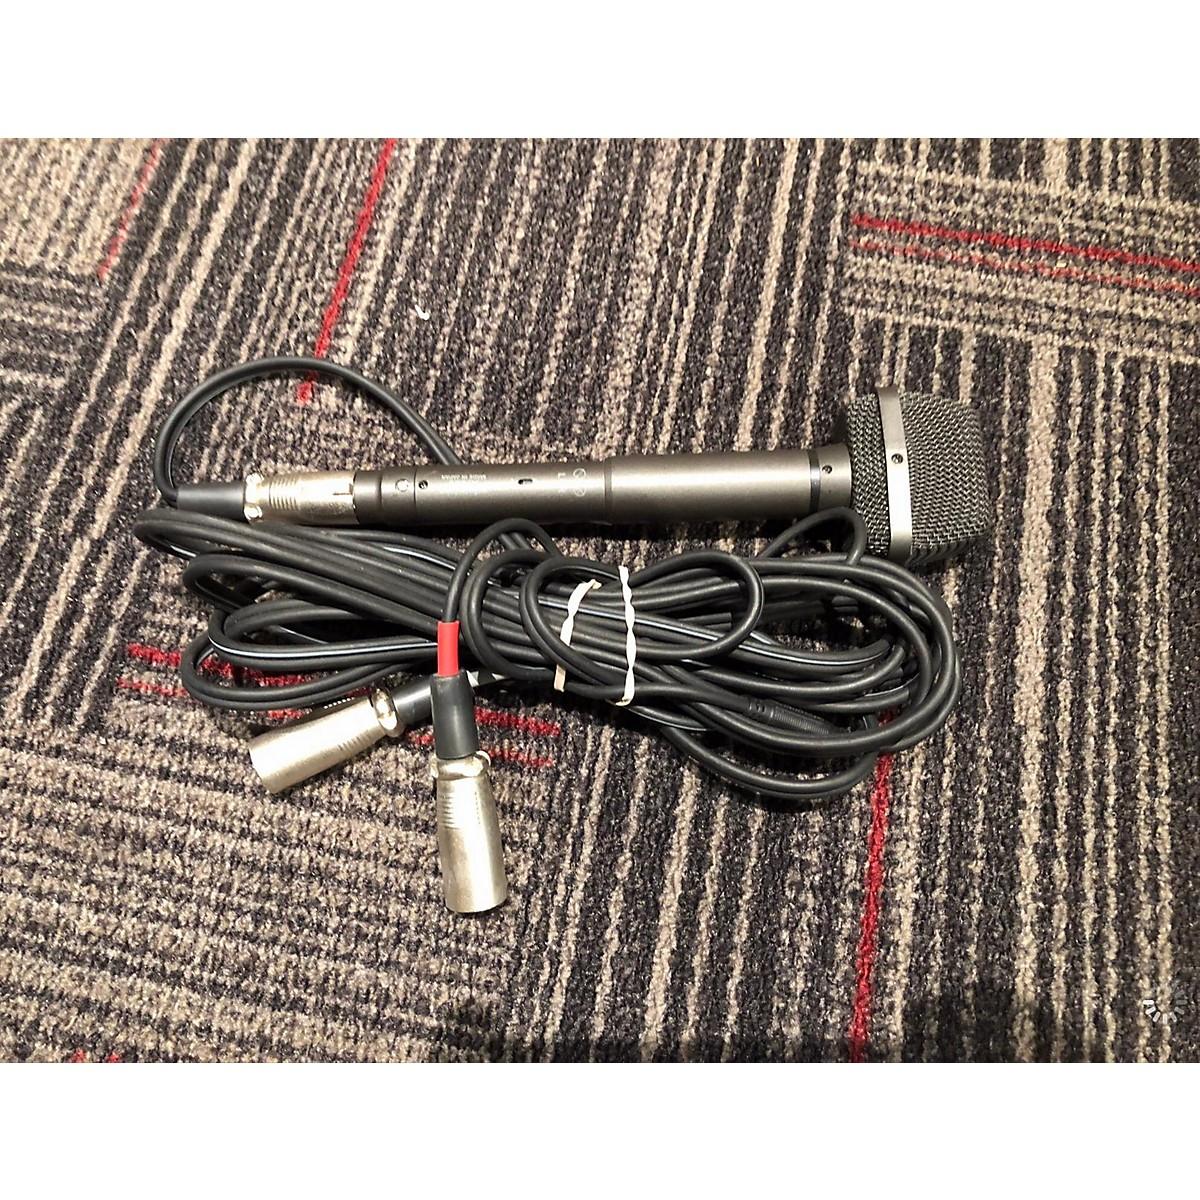 Audio-Technica At825 Condenser Microphone